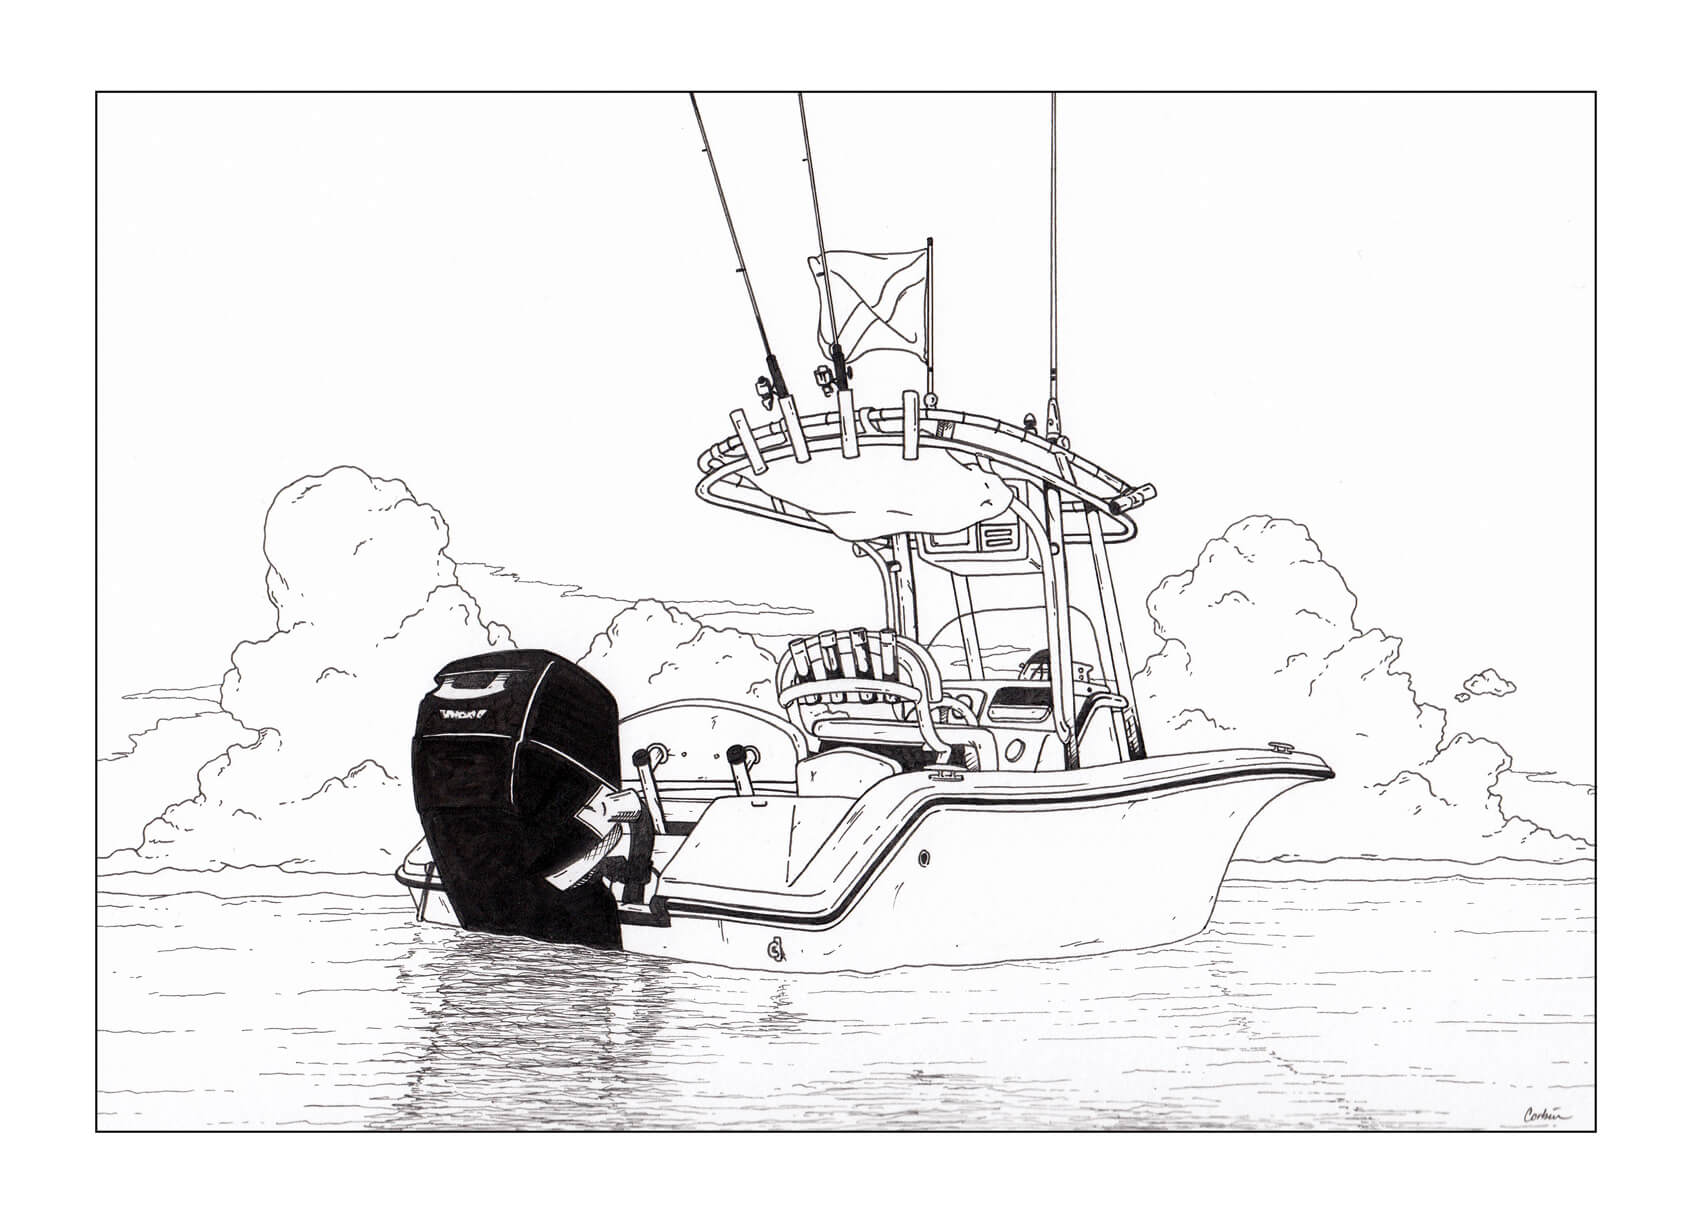 powerboat in water